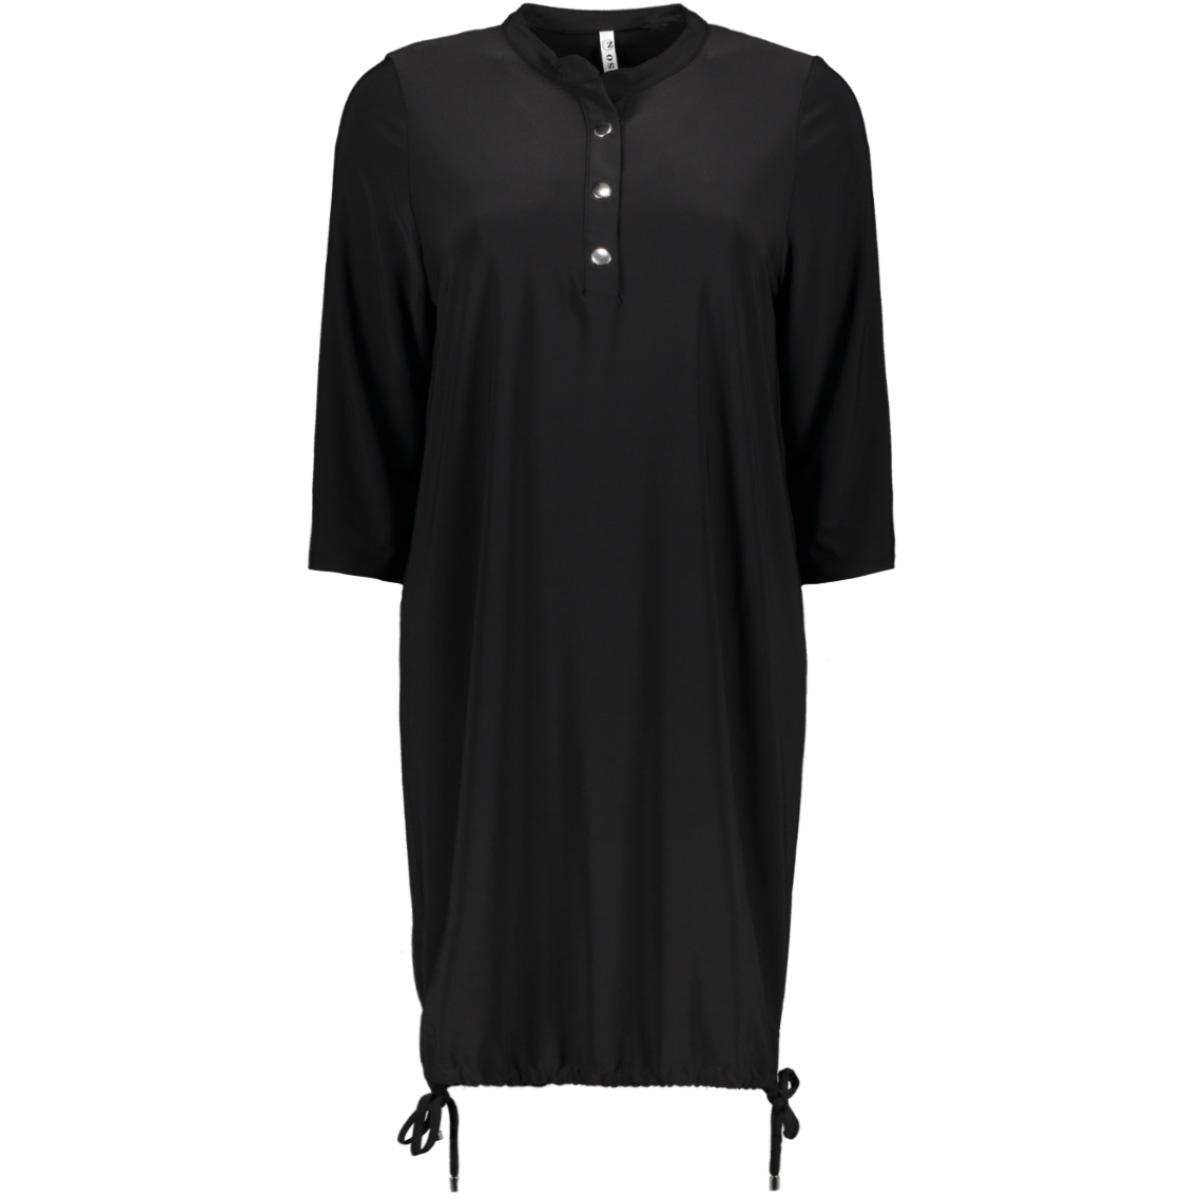 wow 2 splendour tunic zoso jurk black